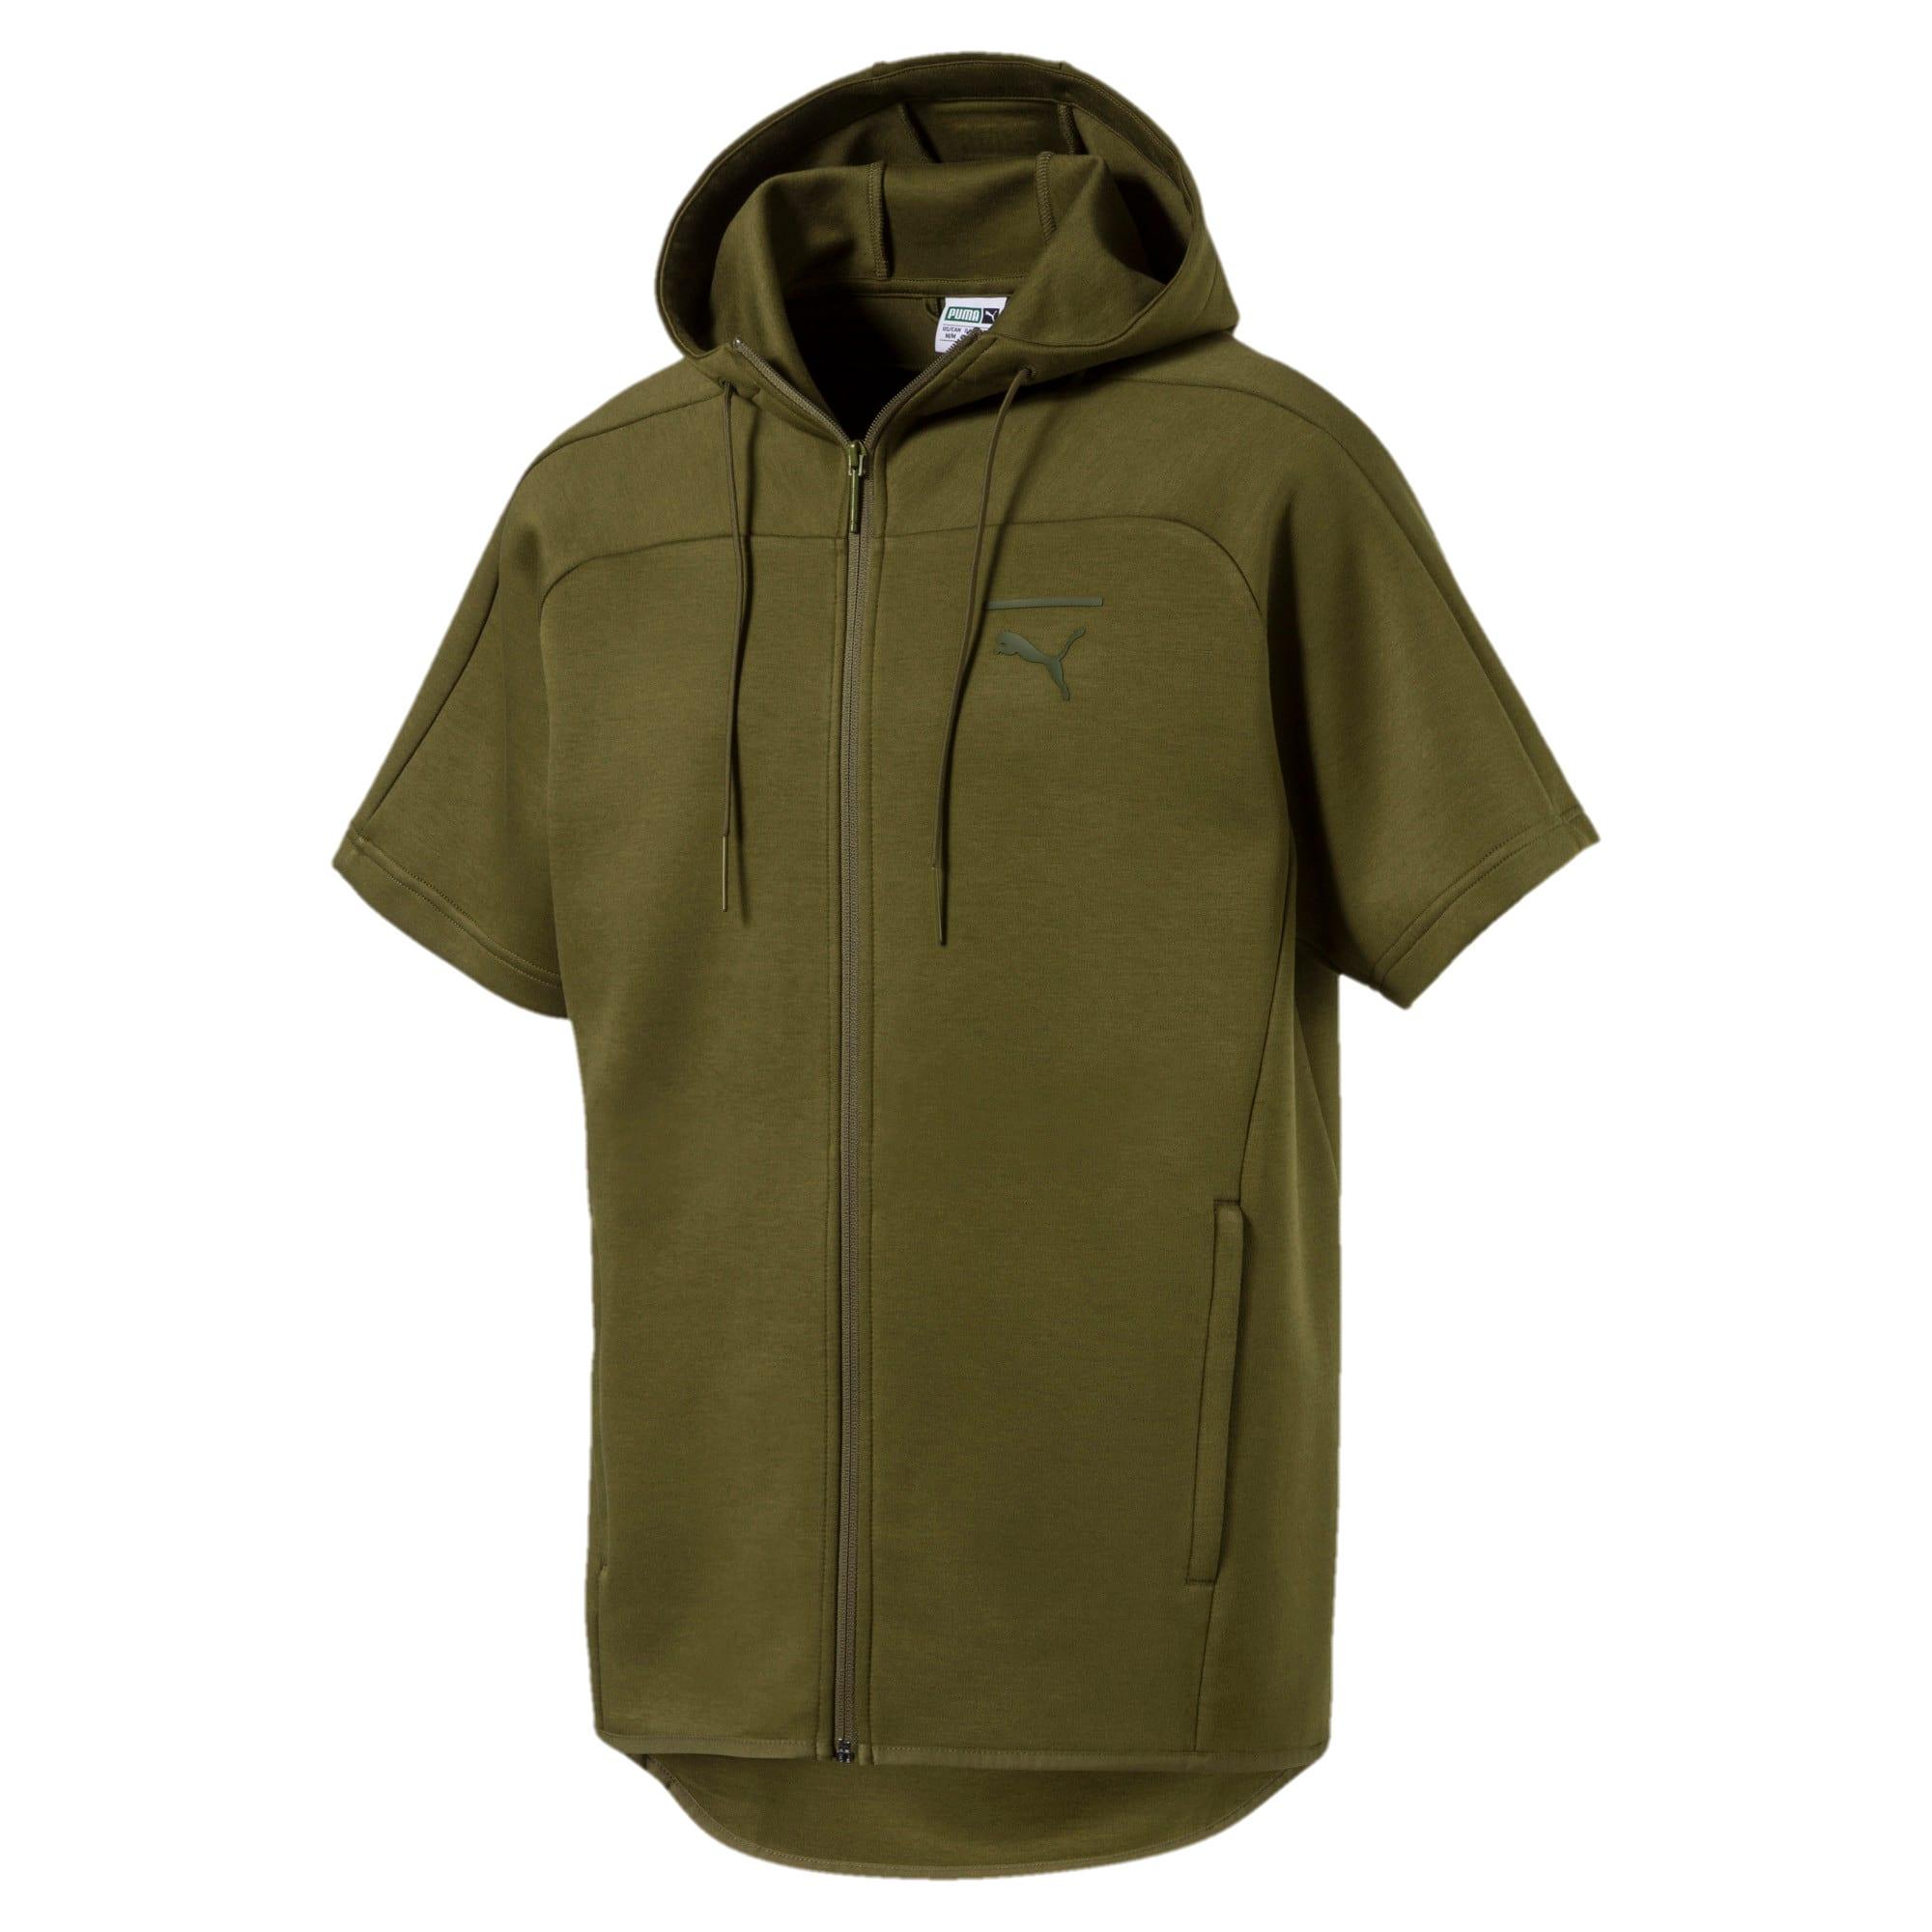 Thumbnail 1 of Pace Men's Short Full Zip Sleeve Trend Top, Capulet Olive, medium-IND